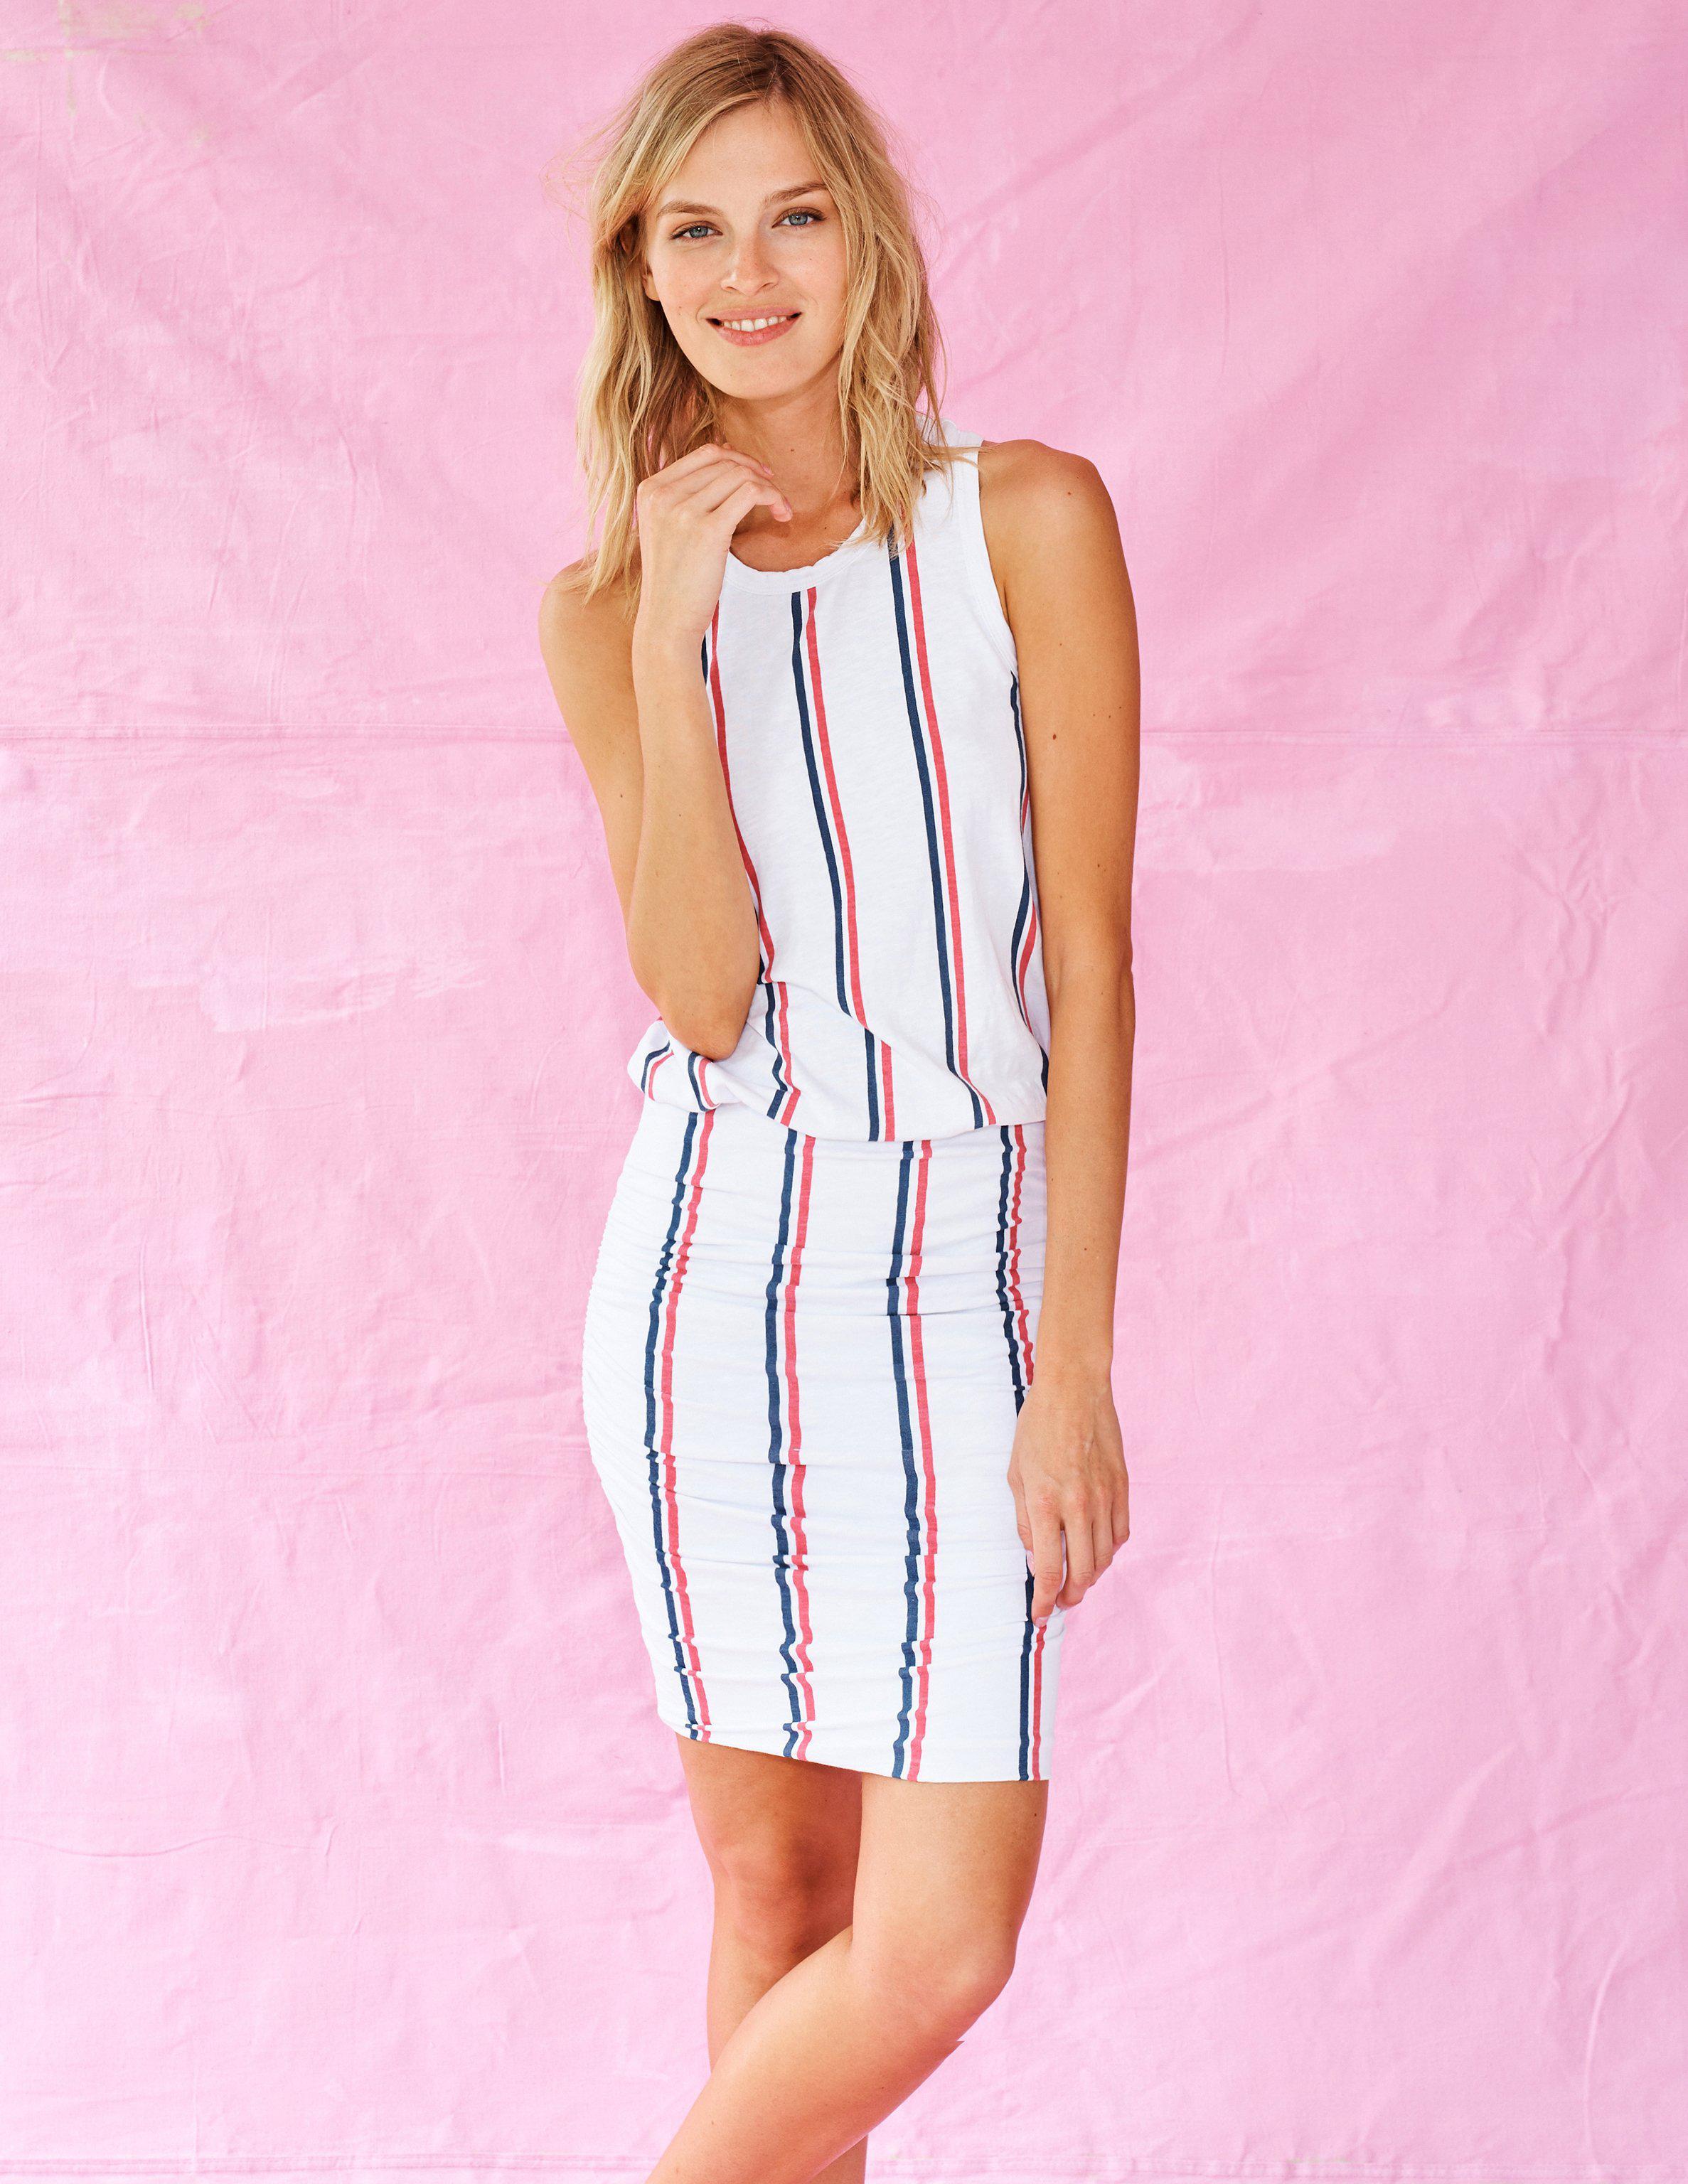 633dc55f43731 Lyst - Sundry Stripes Sleeveless Dress in White